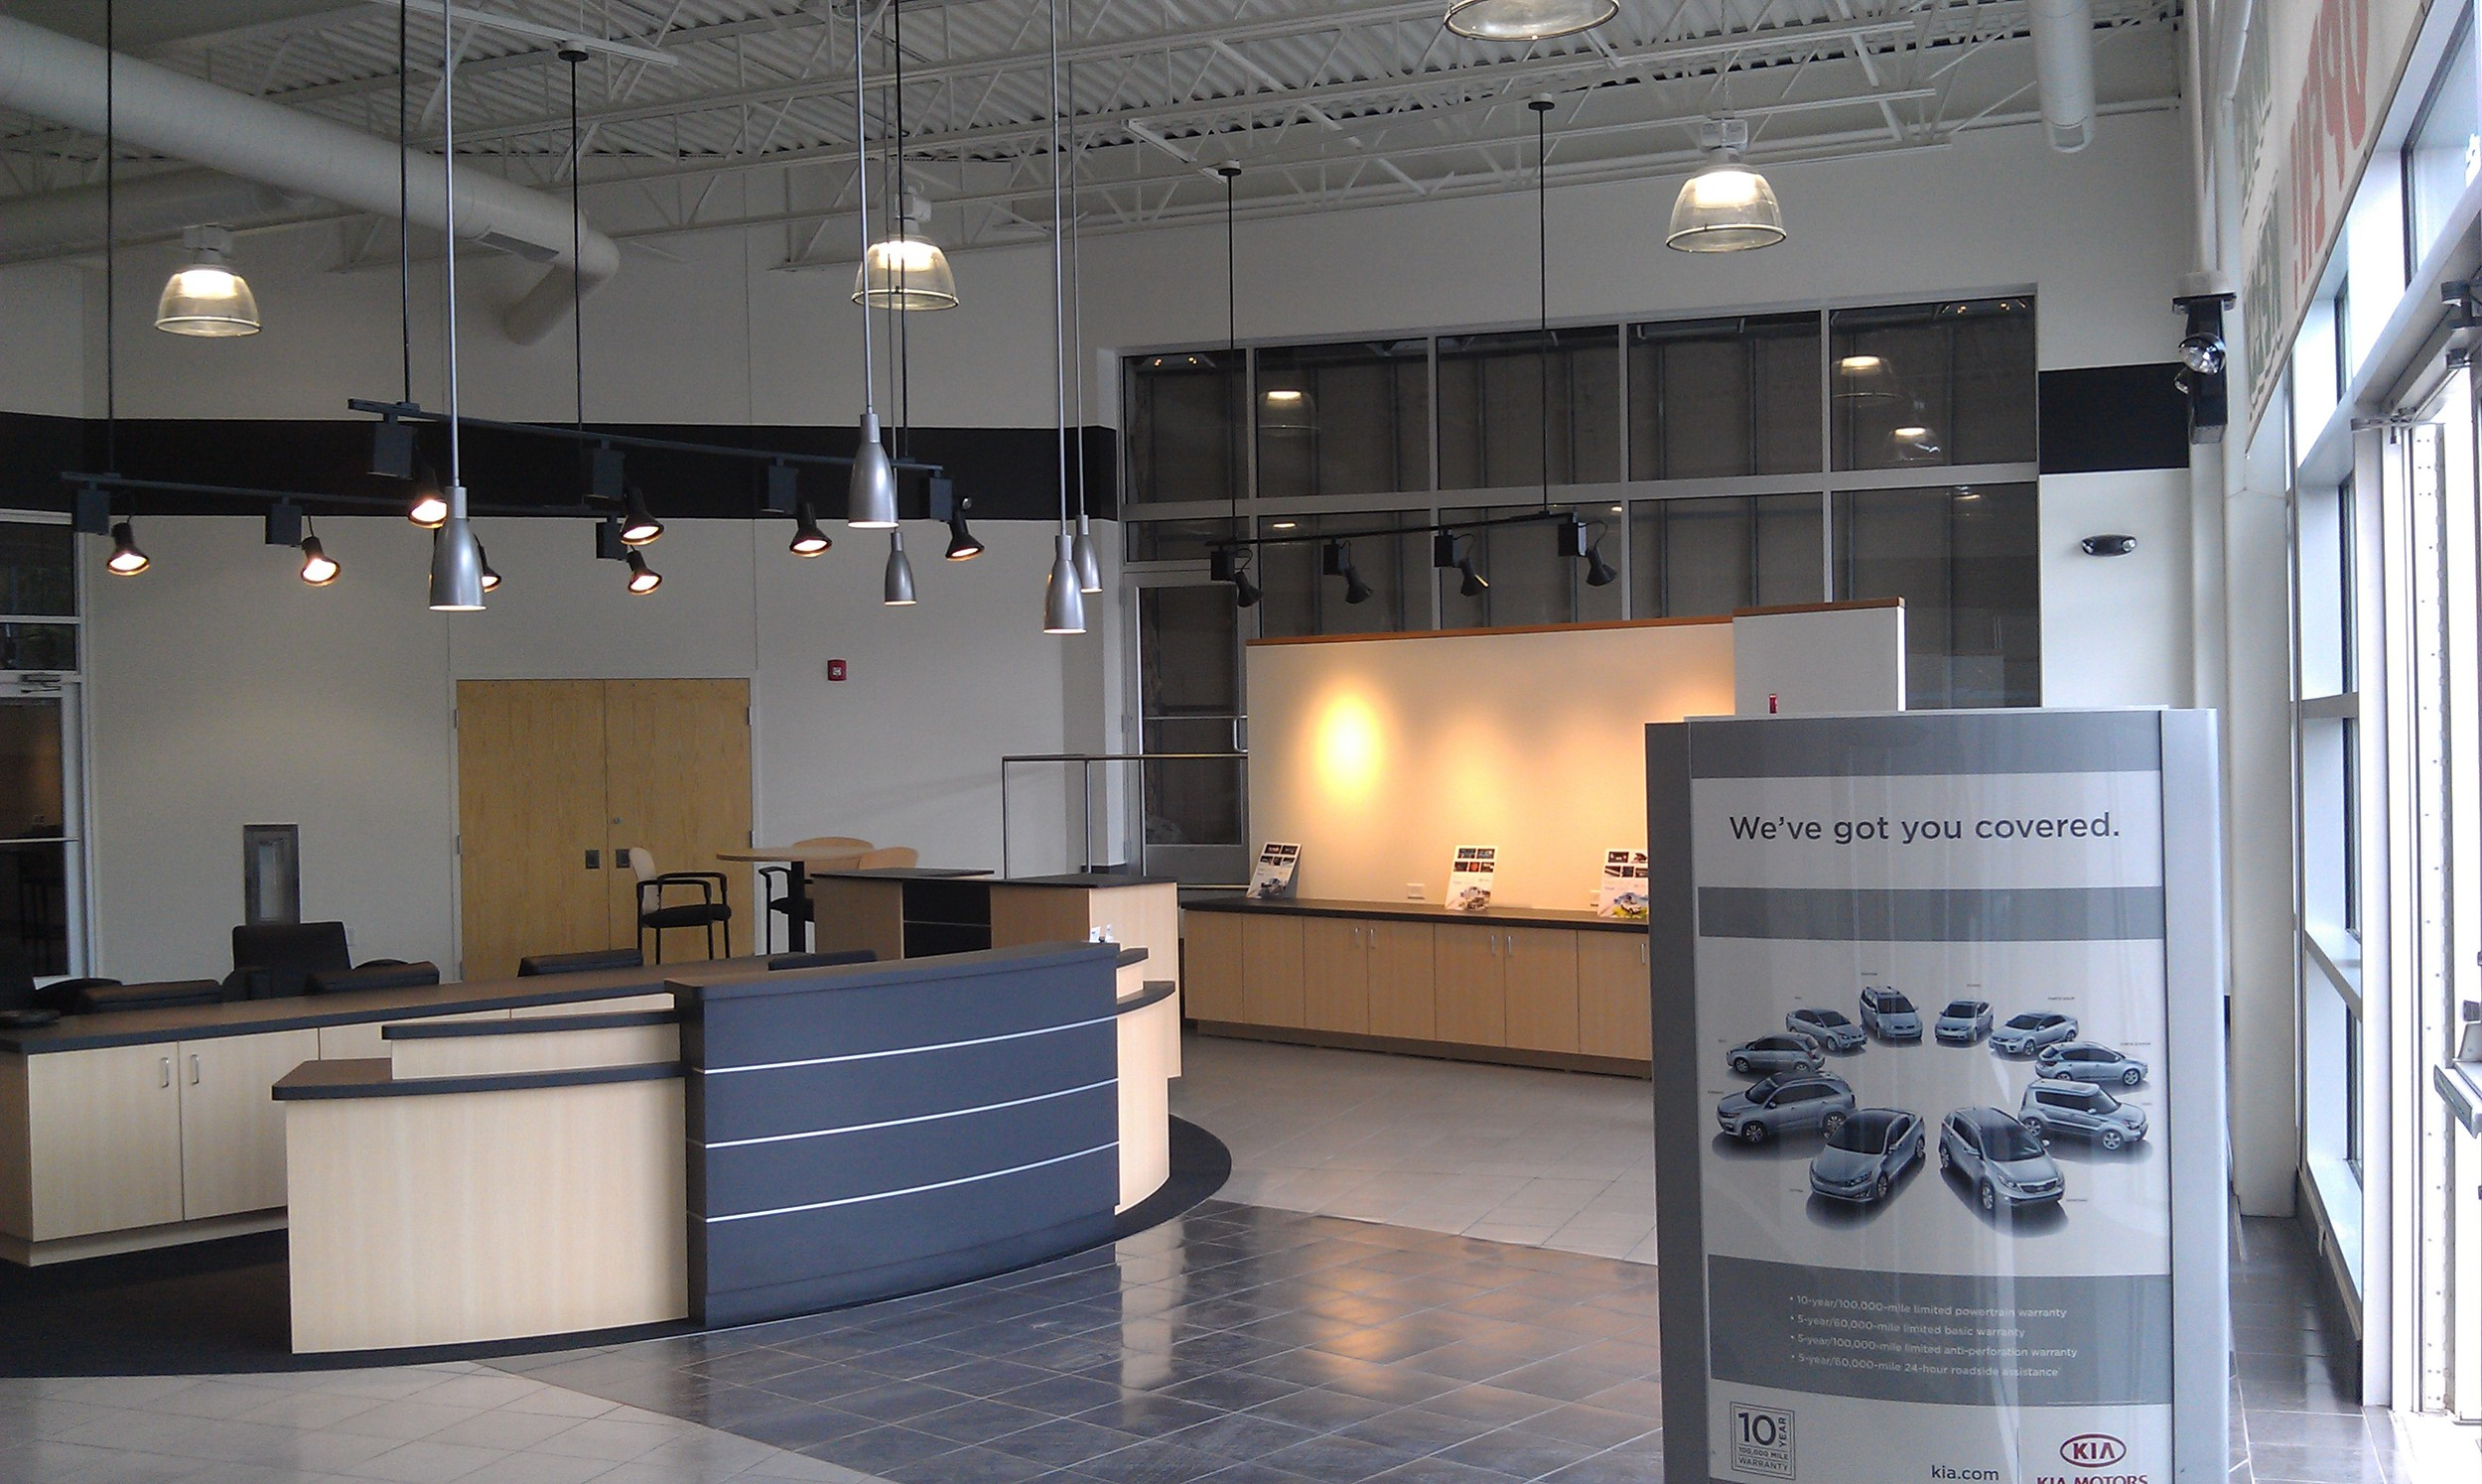 Kelly Kia Dealership (interior), Butler, PA